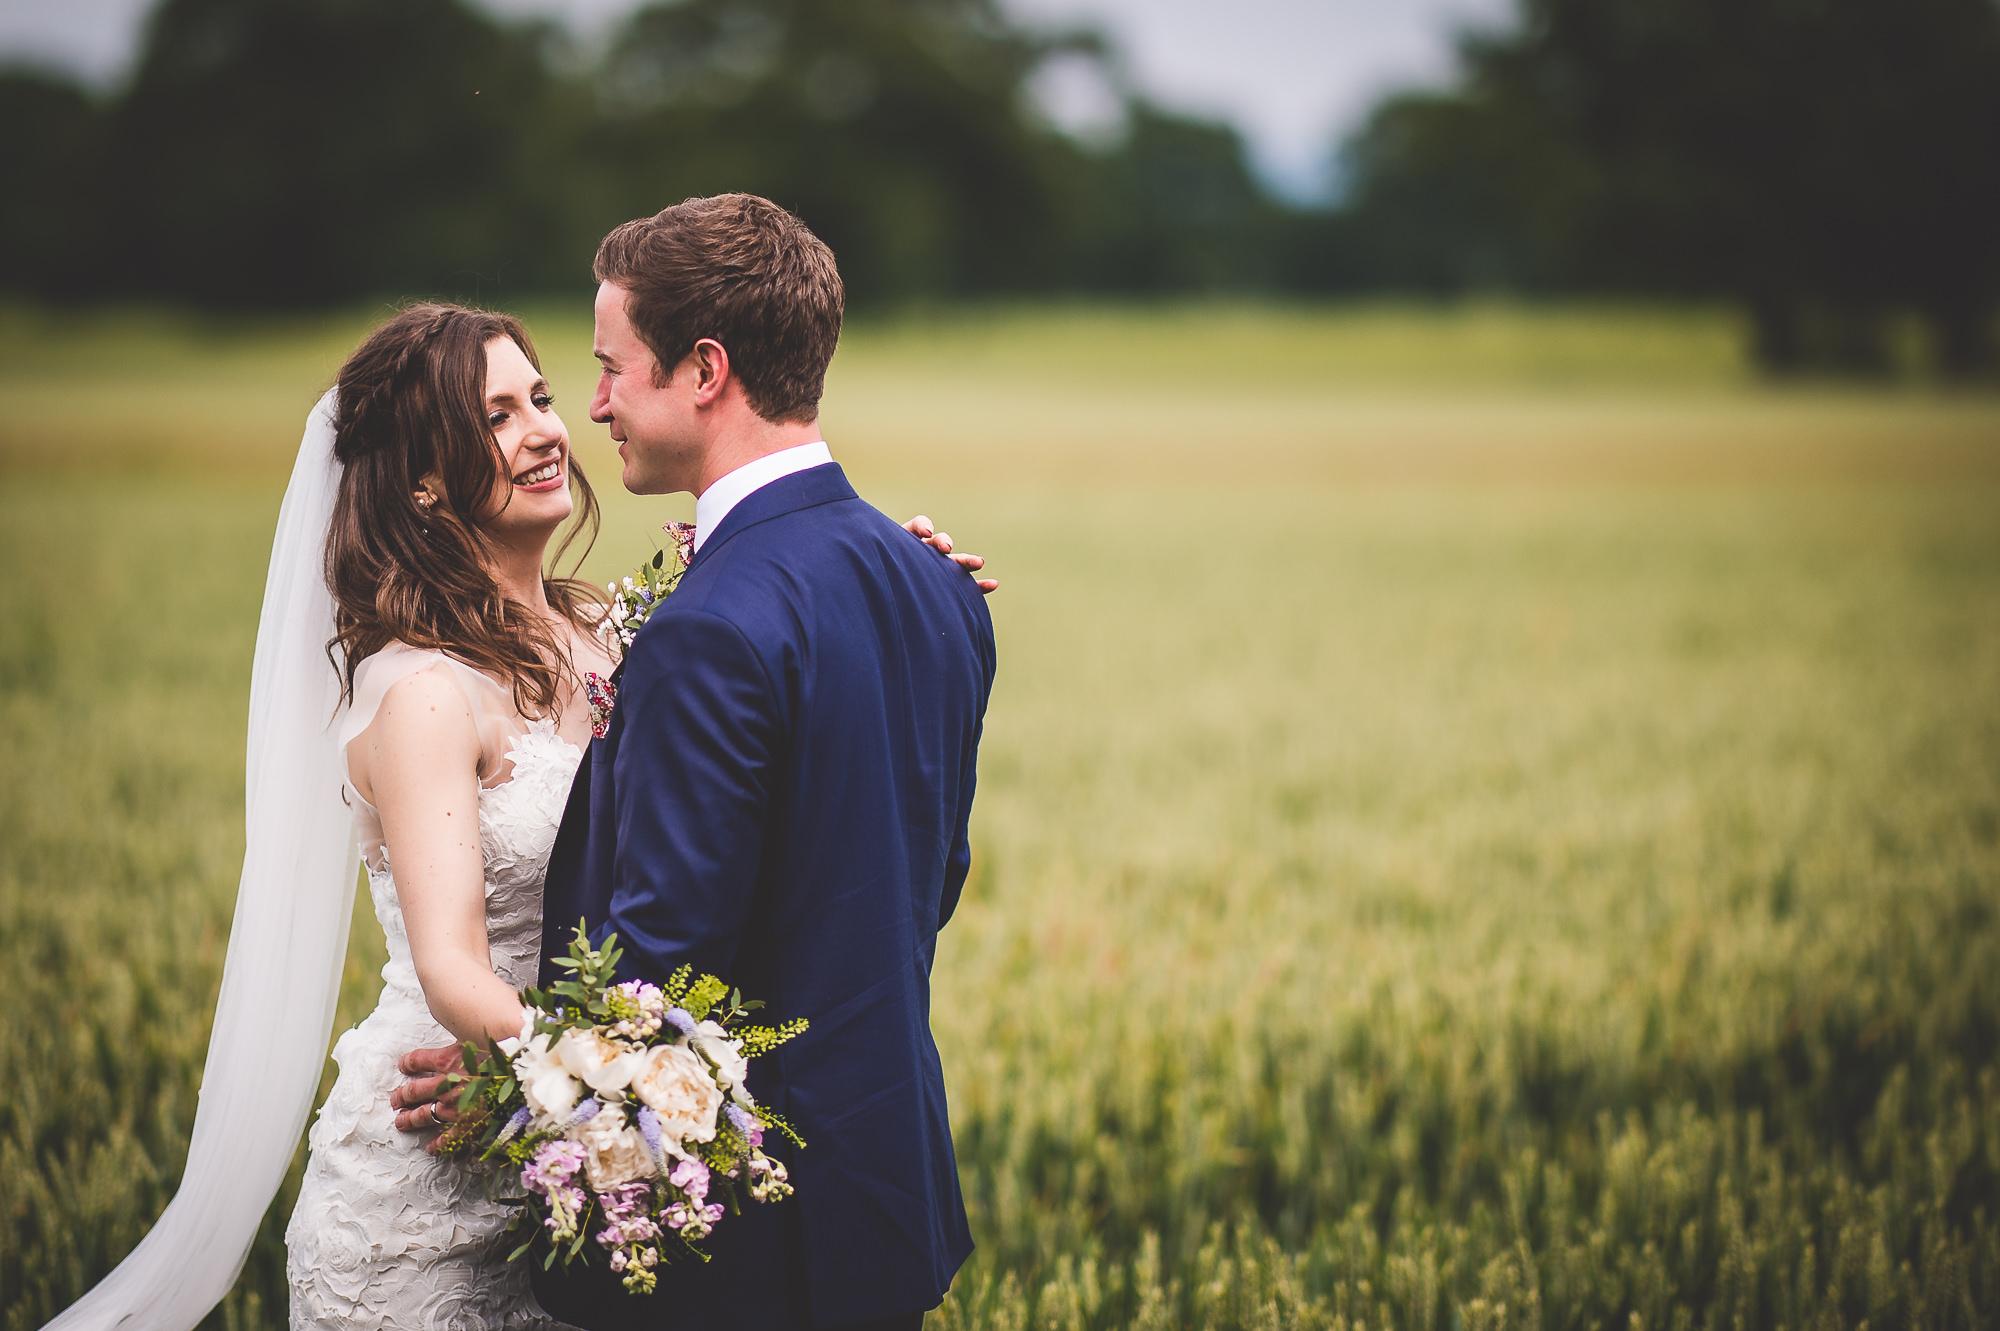 Veils & Bales Wedding Photography | Charlie & Steve SCSS 133